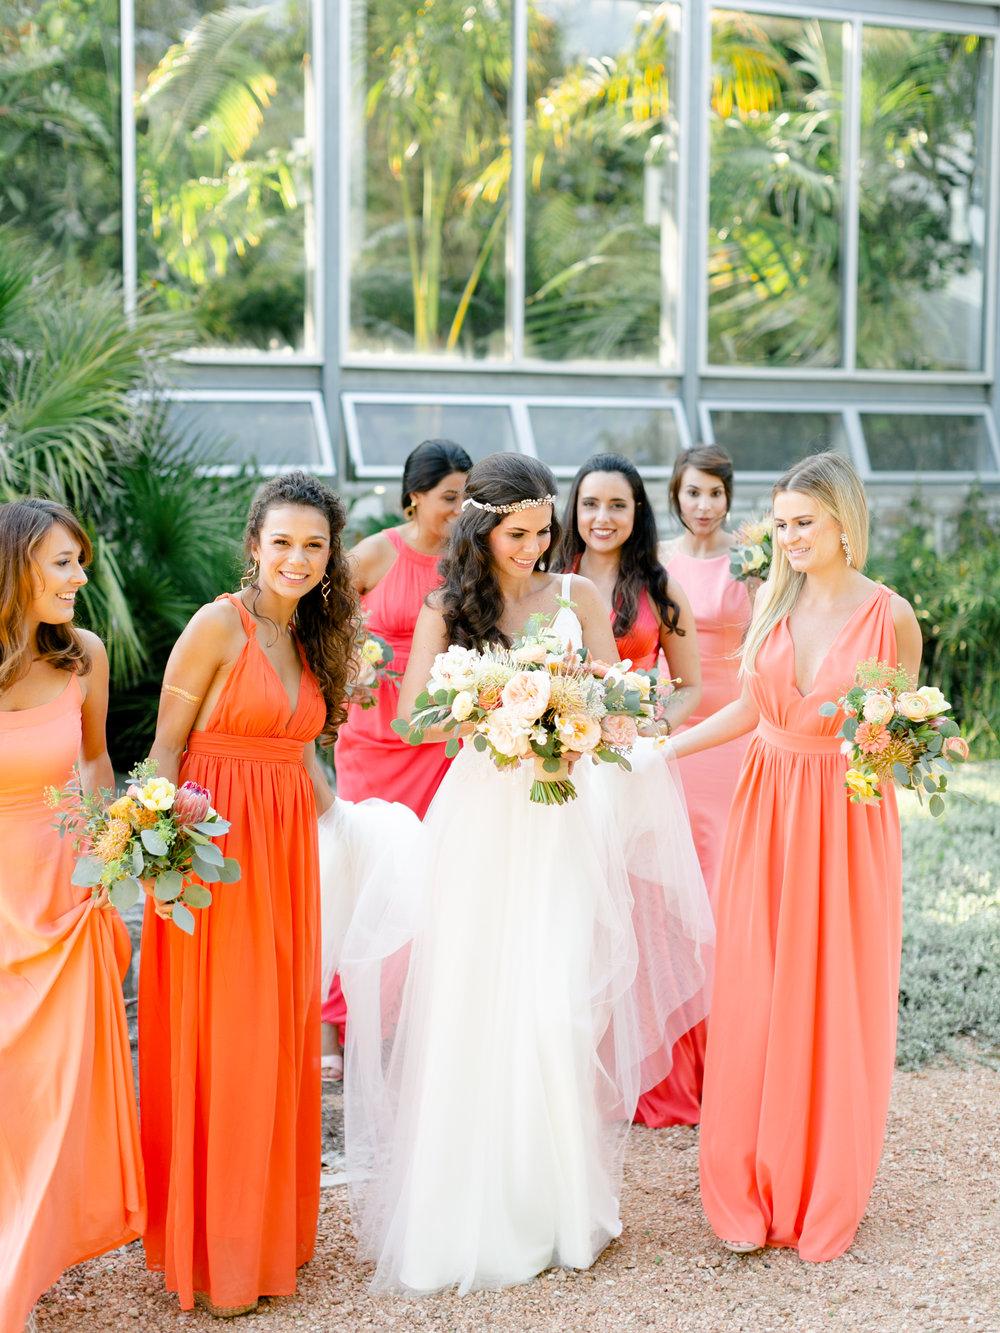 Best-Austin-Denver-California-Wedding-Photographer-Greenhouse-Driftwood22.jpg